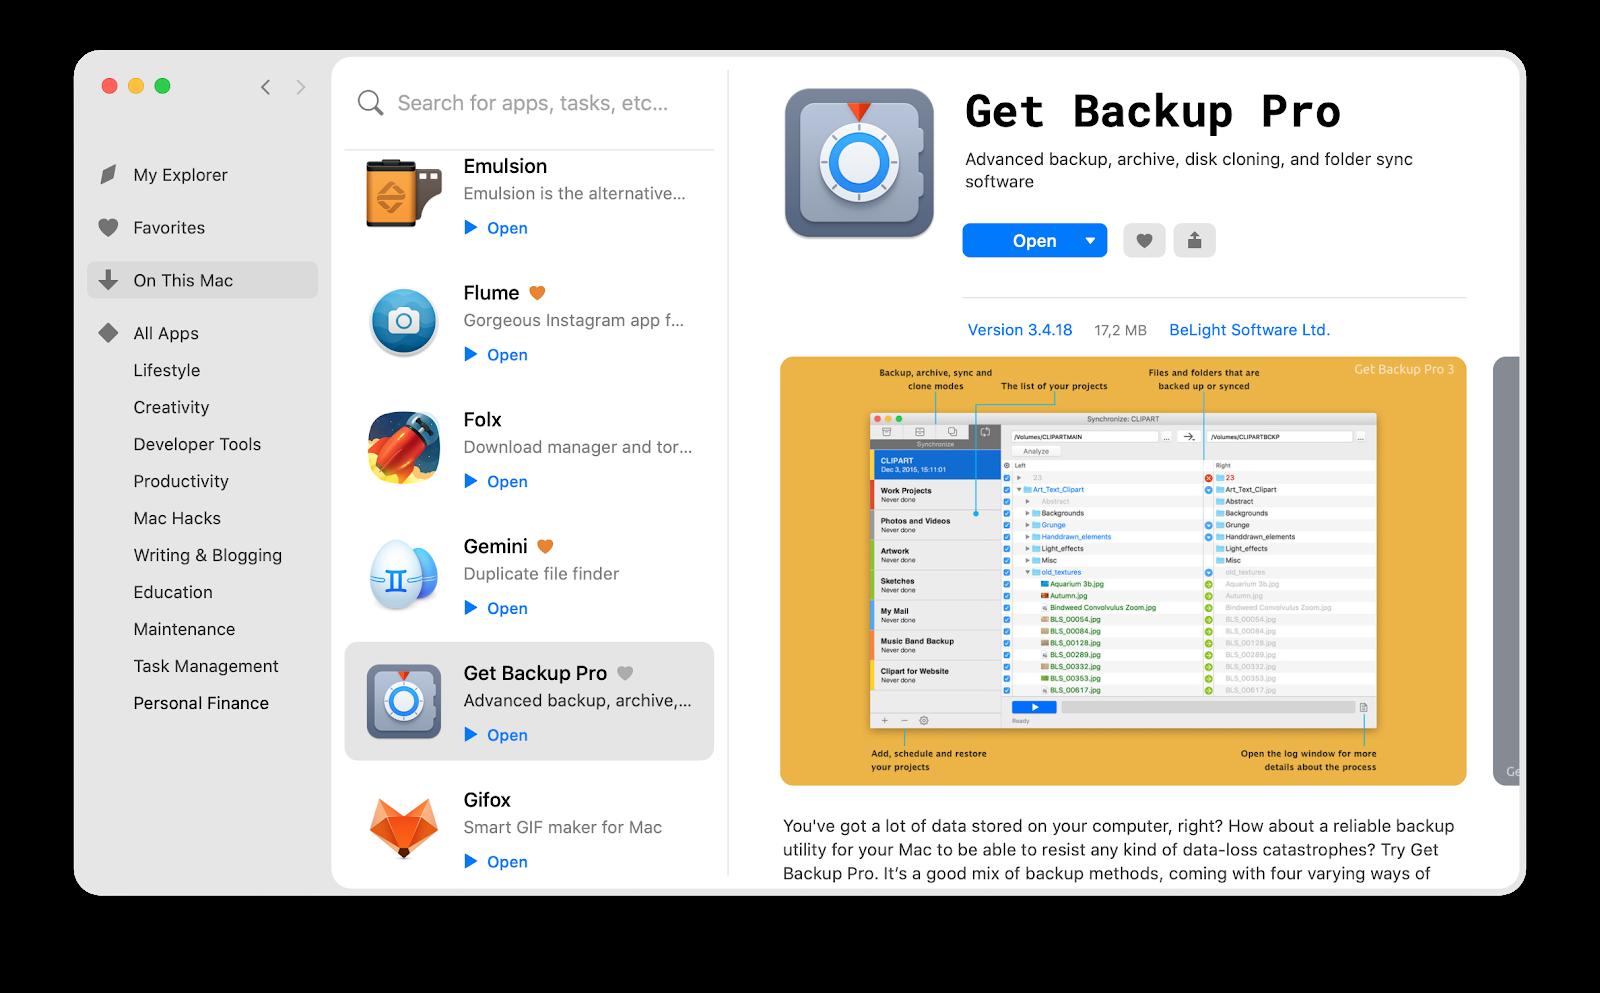 Get Backup Pro on Setapp